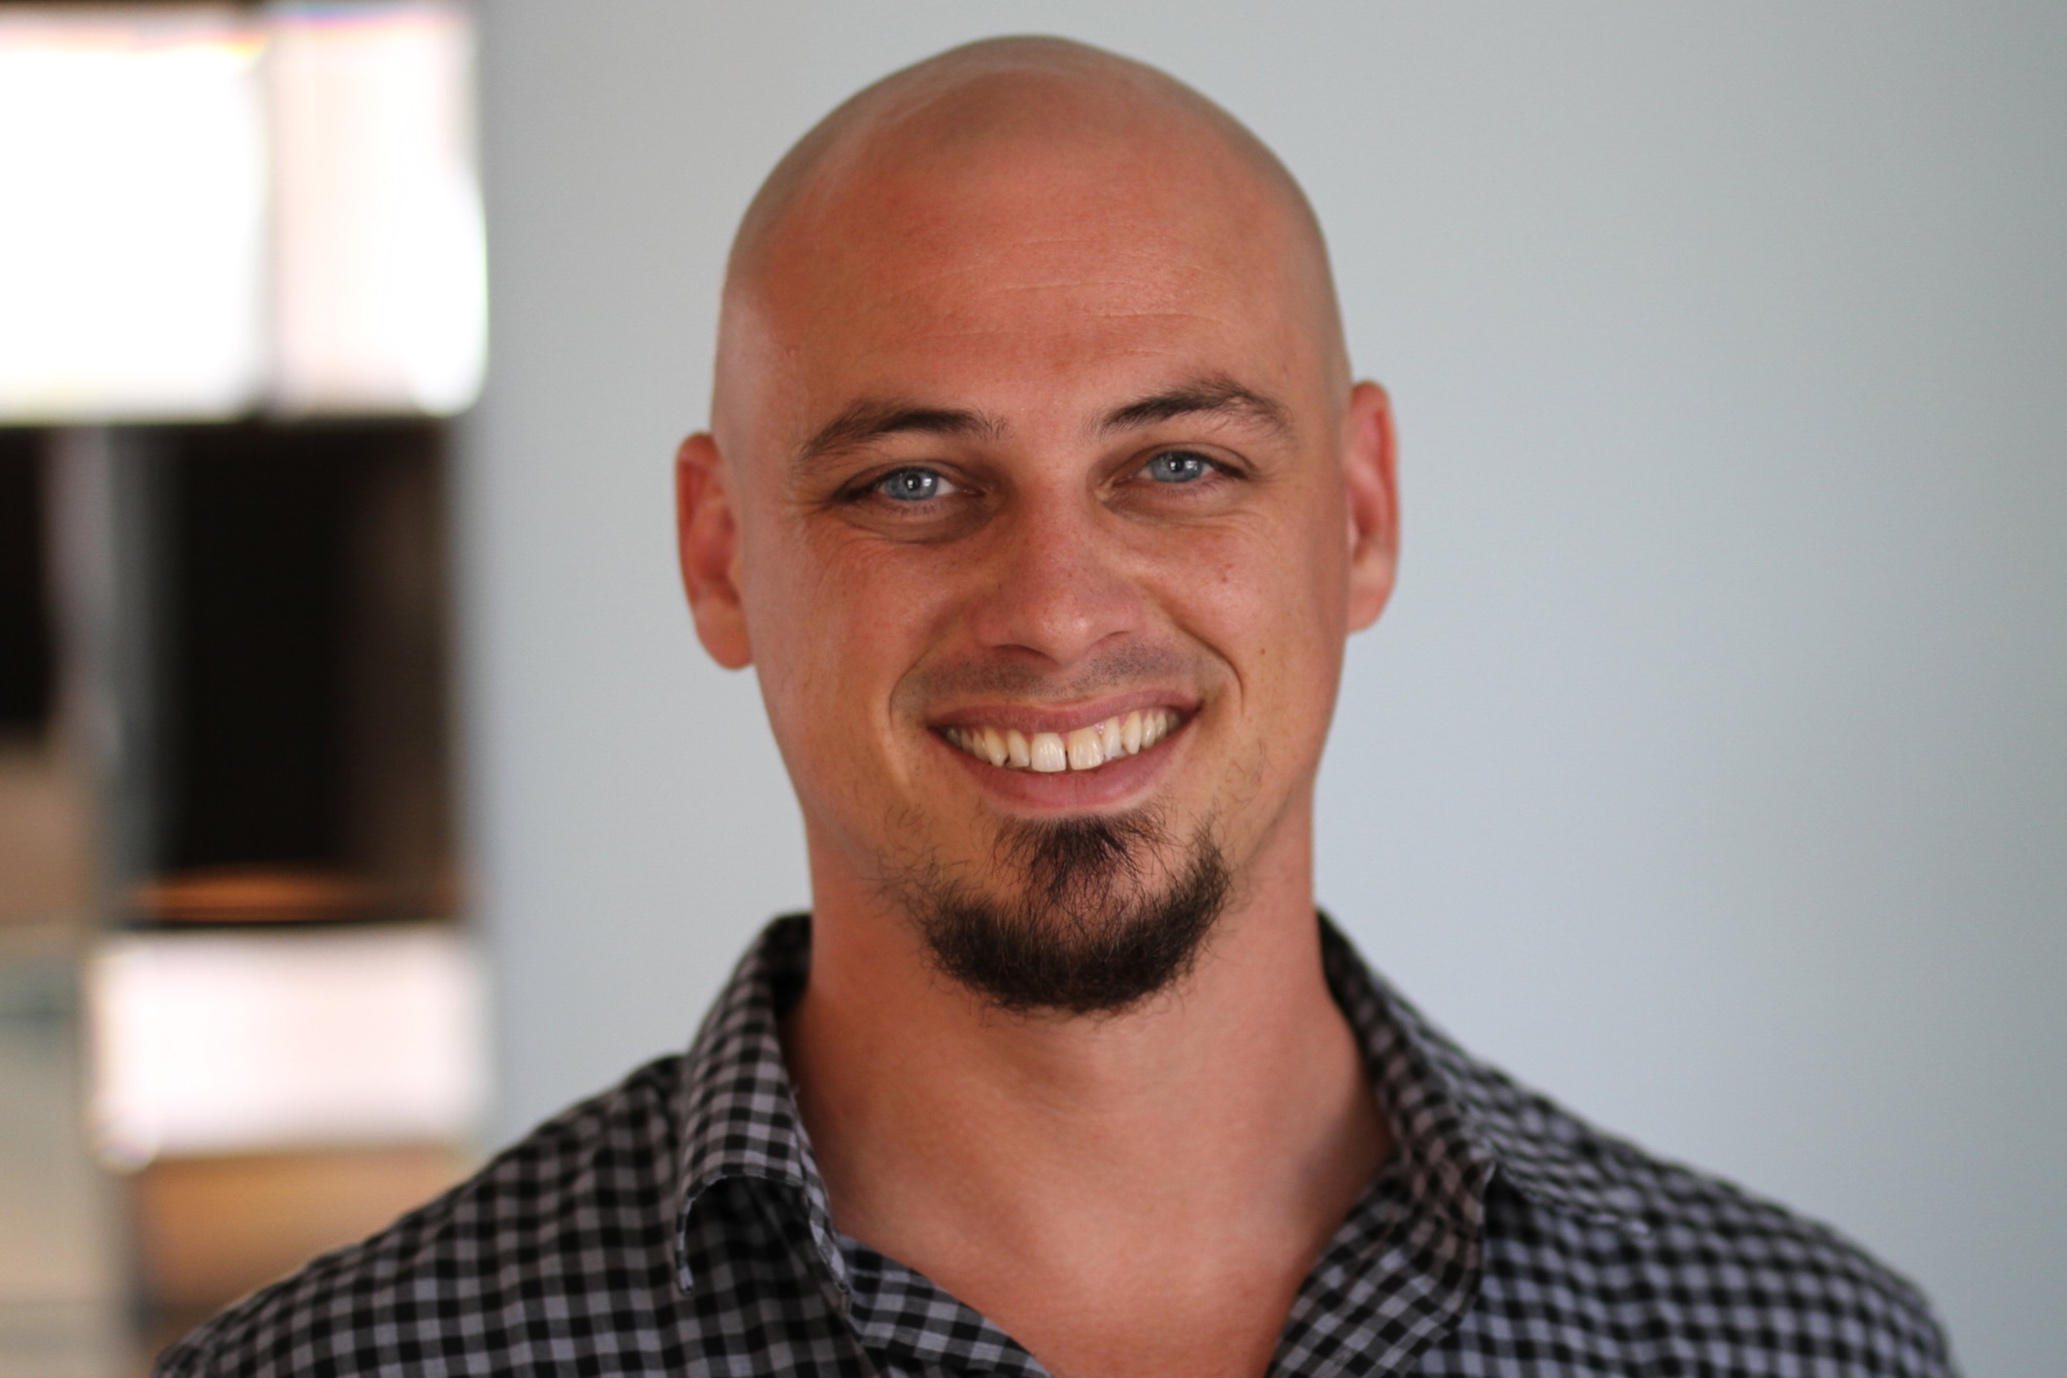 Ryan Grow - Filmmaker from Bangor, Maine